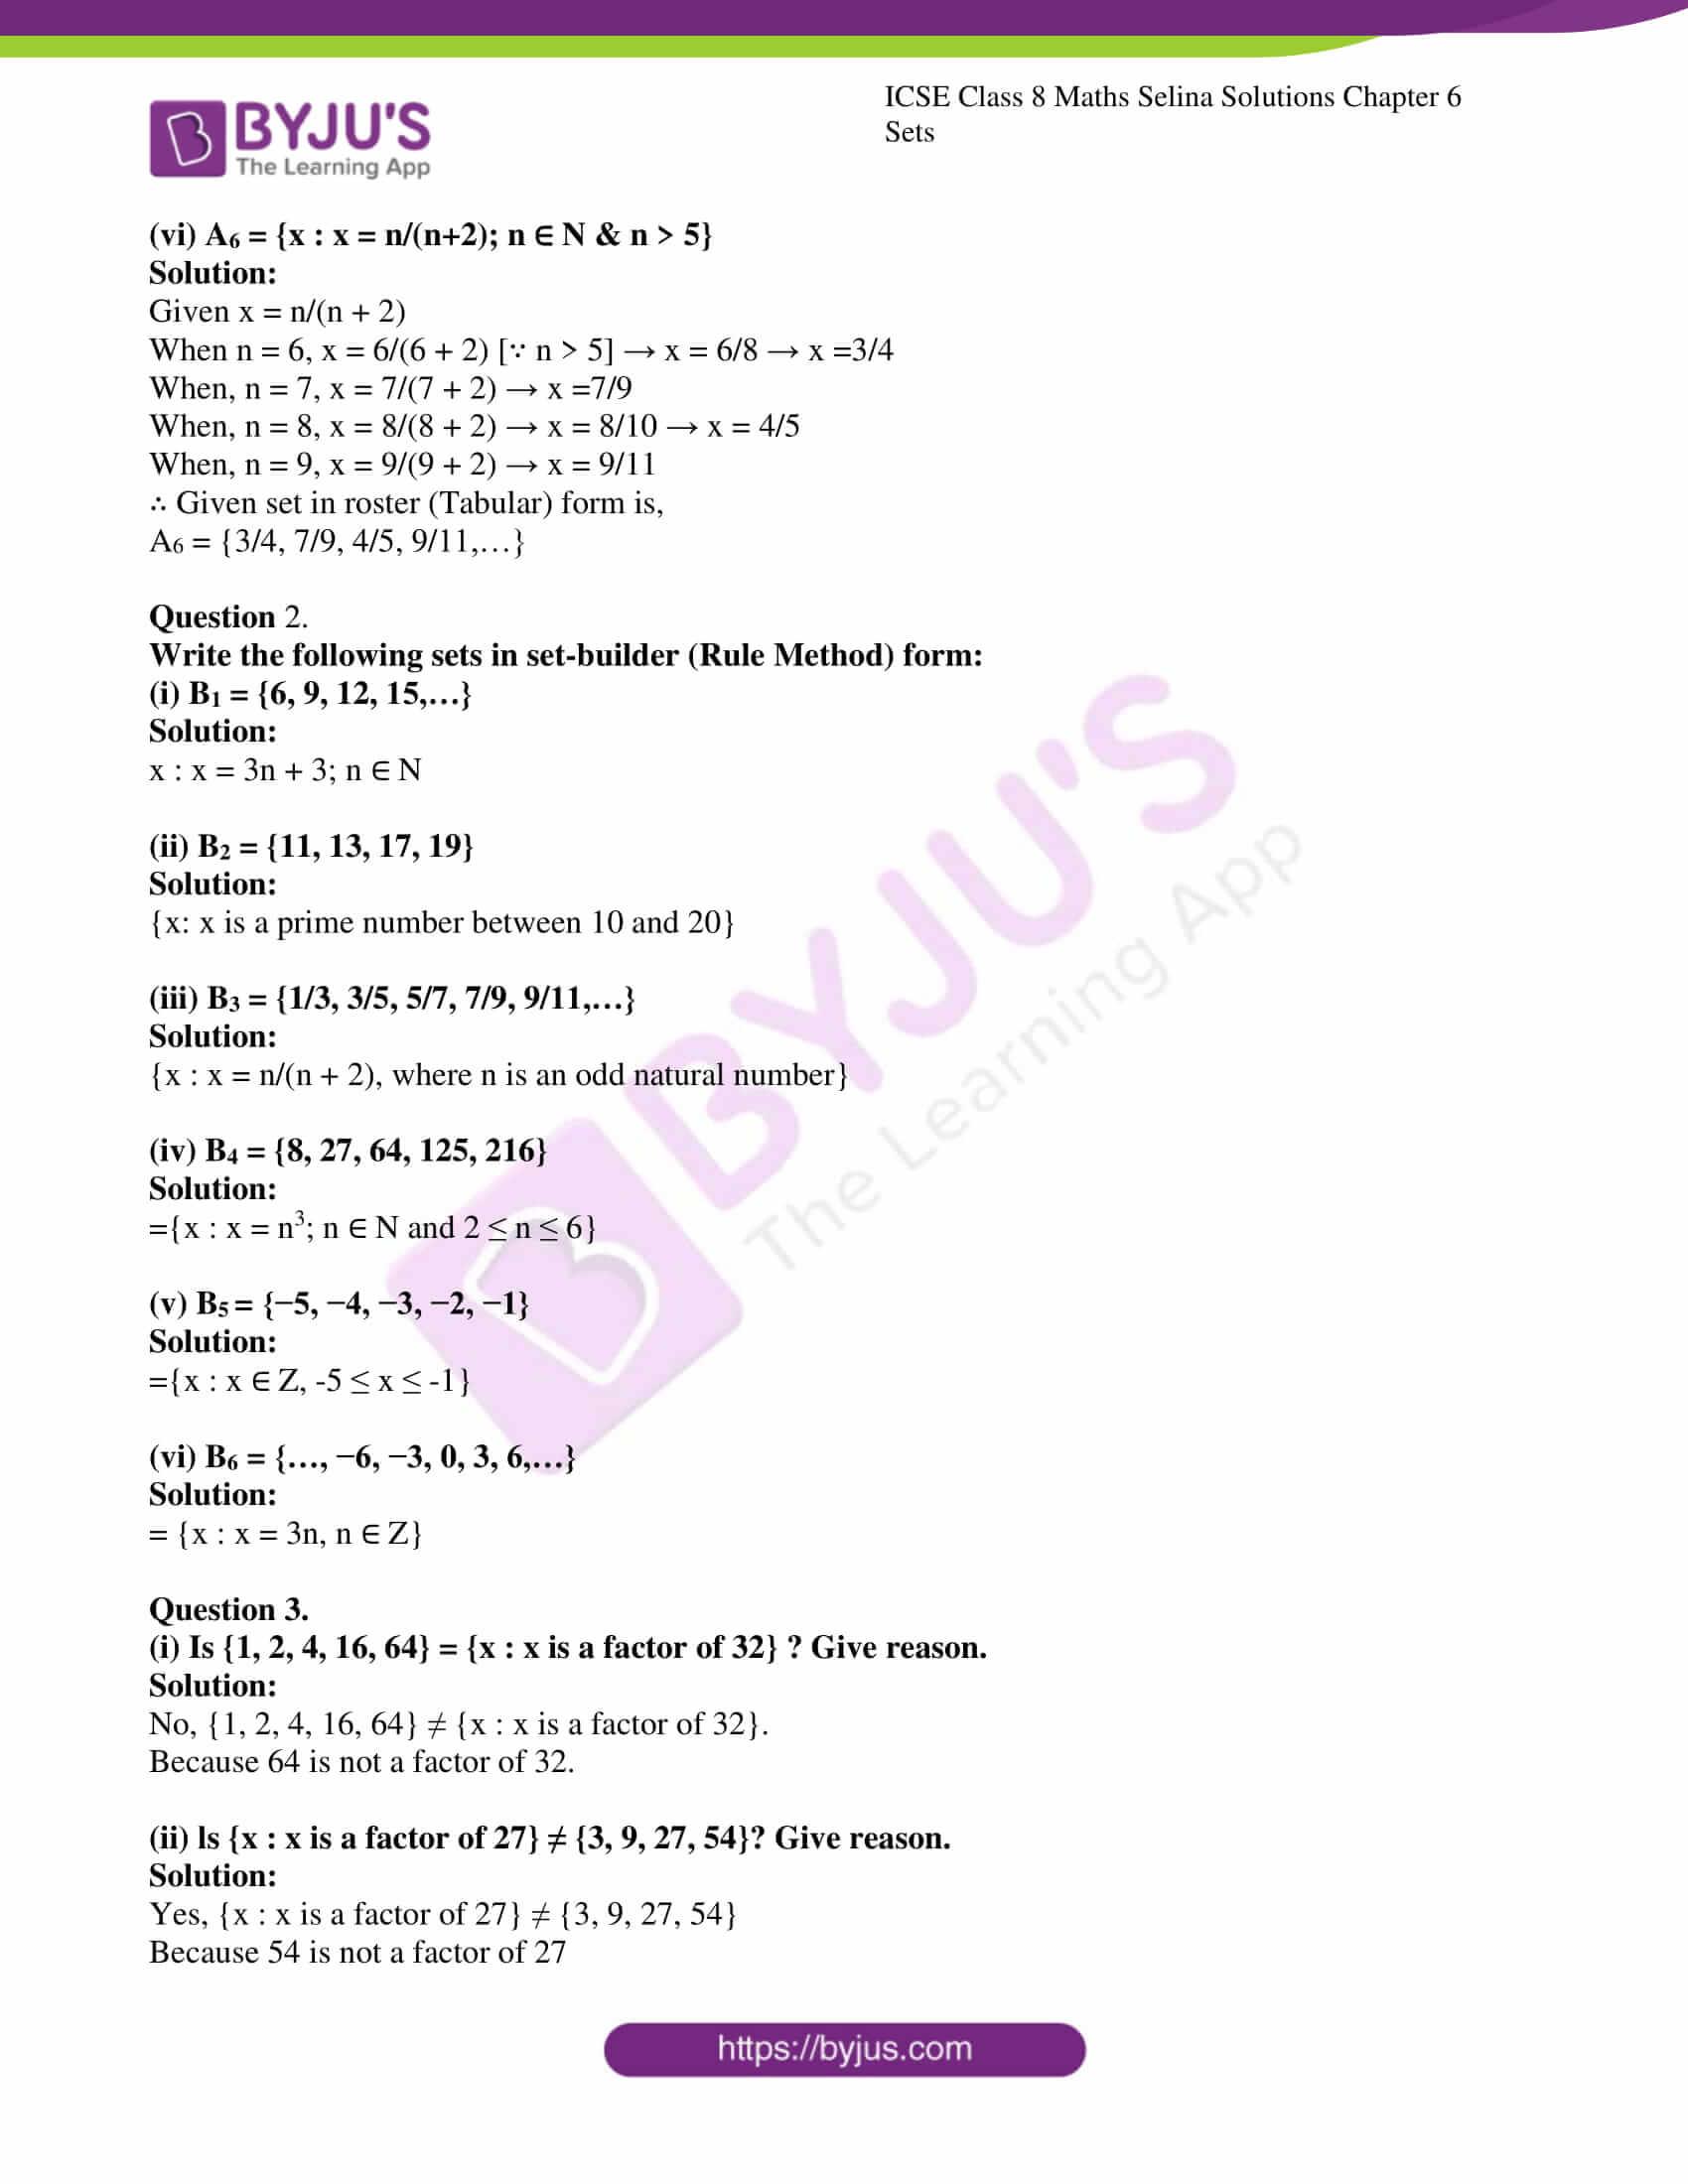 icse april7 class 8 maths selina solutions chapter 6 sets 02